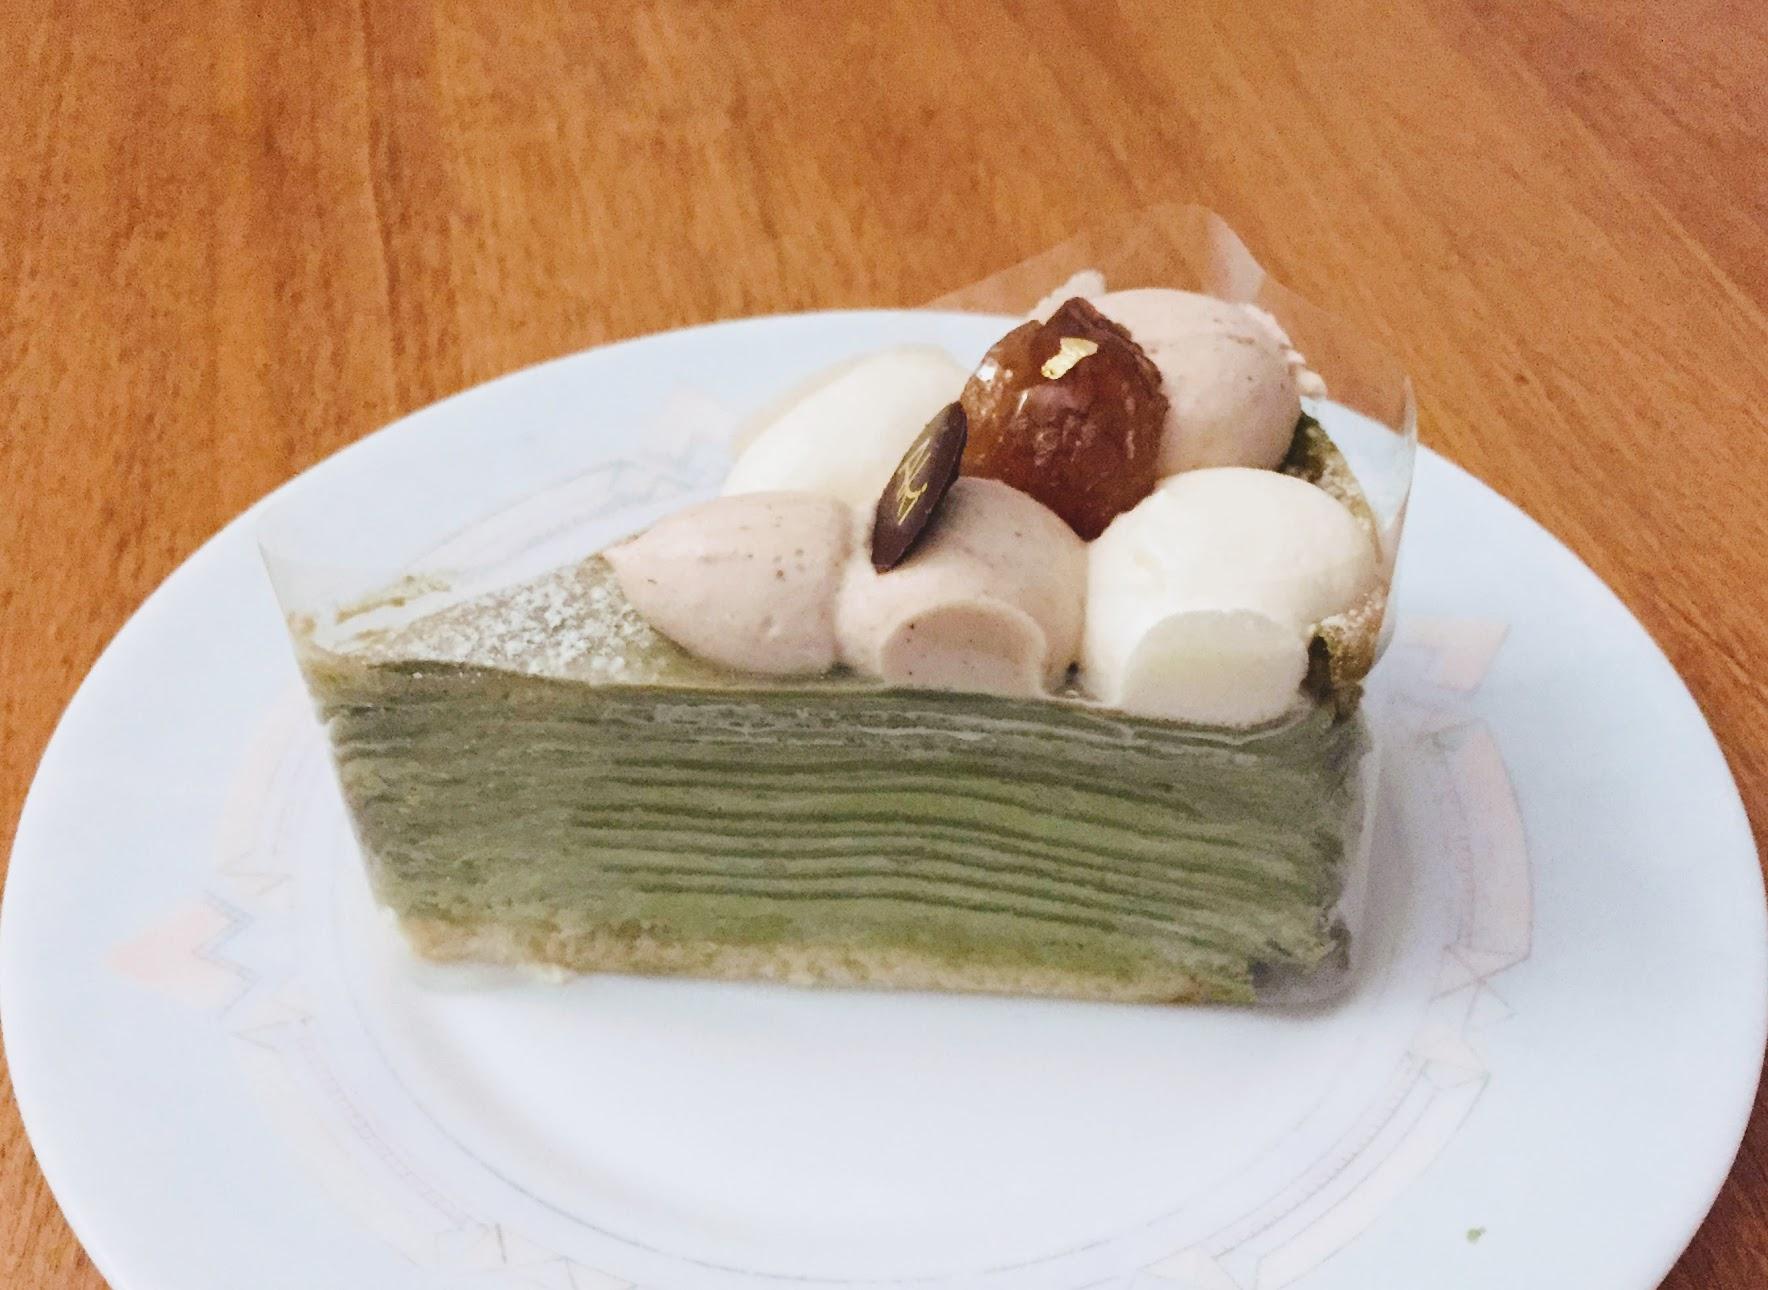 Aki Boulanger アキブランジェー 抹茶のミルクレープ